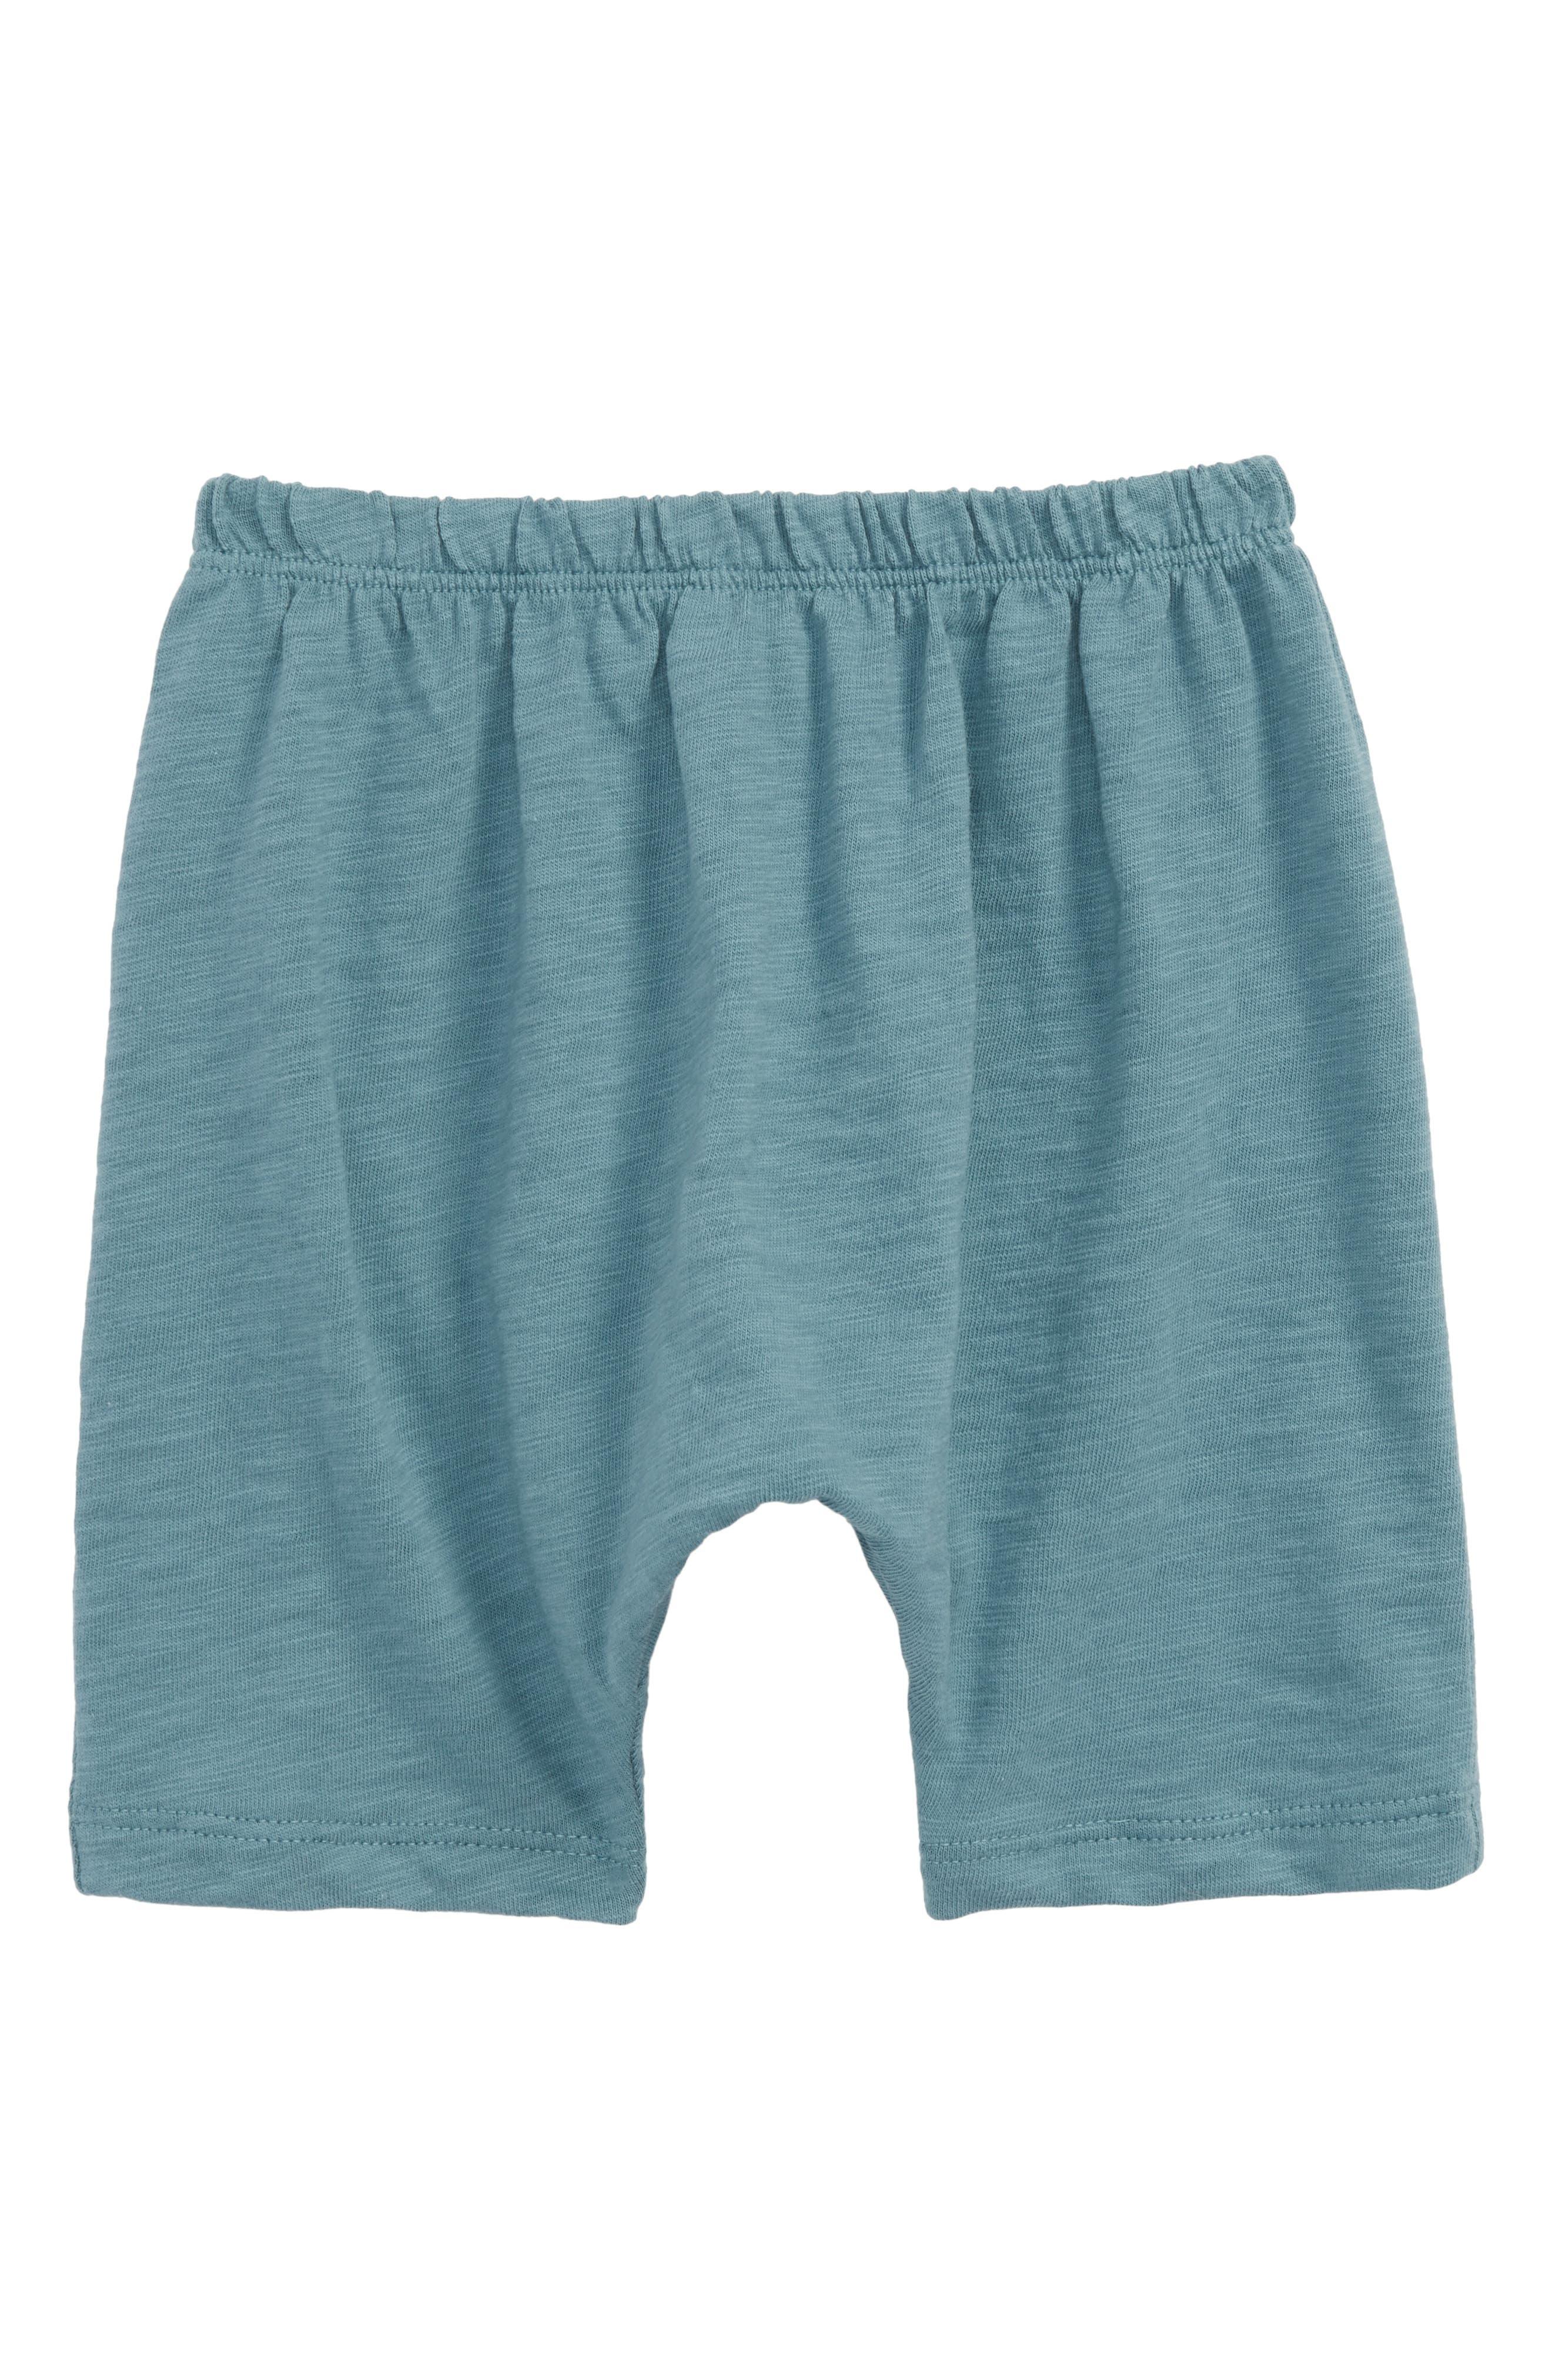 Peek Happy Shorts,                         Main,                         color, 400